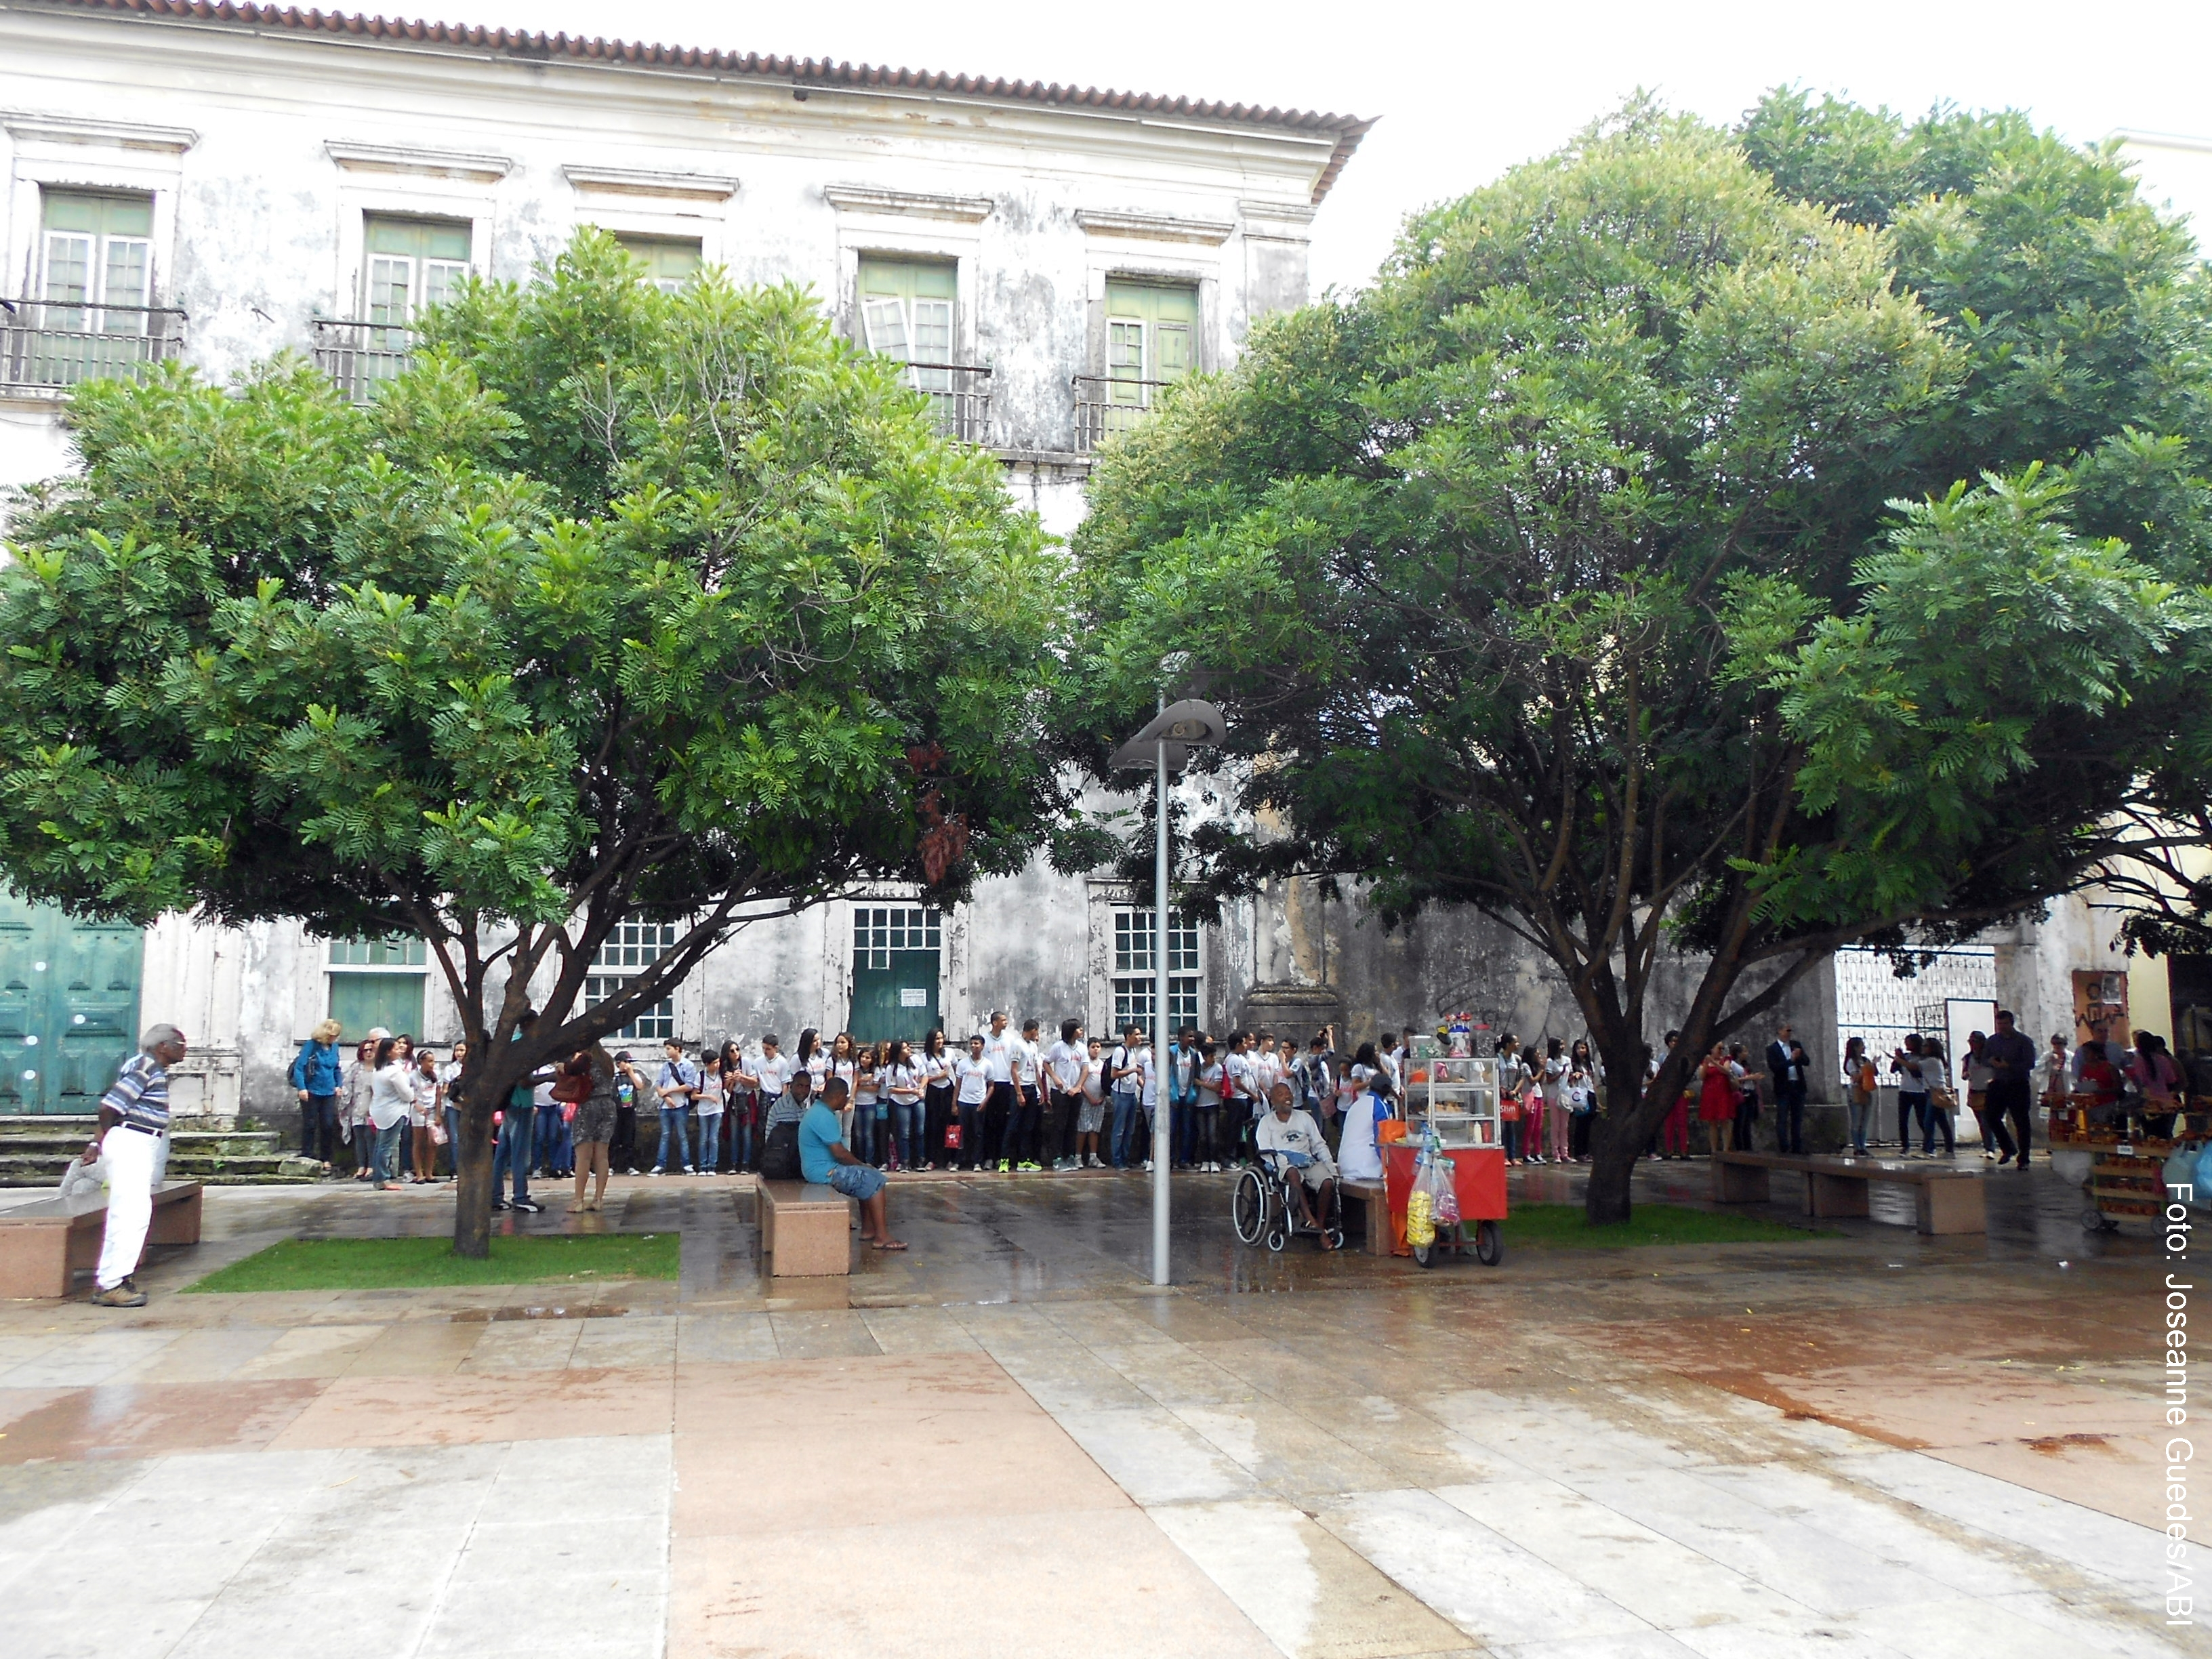 Abraçaço_Palácio Arquiepiscopal - Foto: Joseanne Guedes/ABI